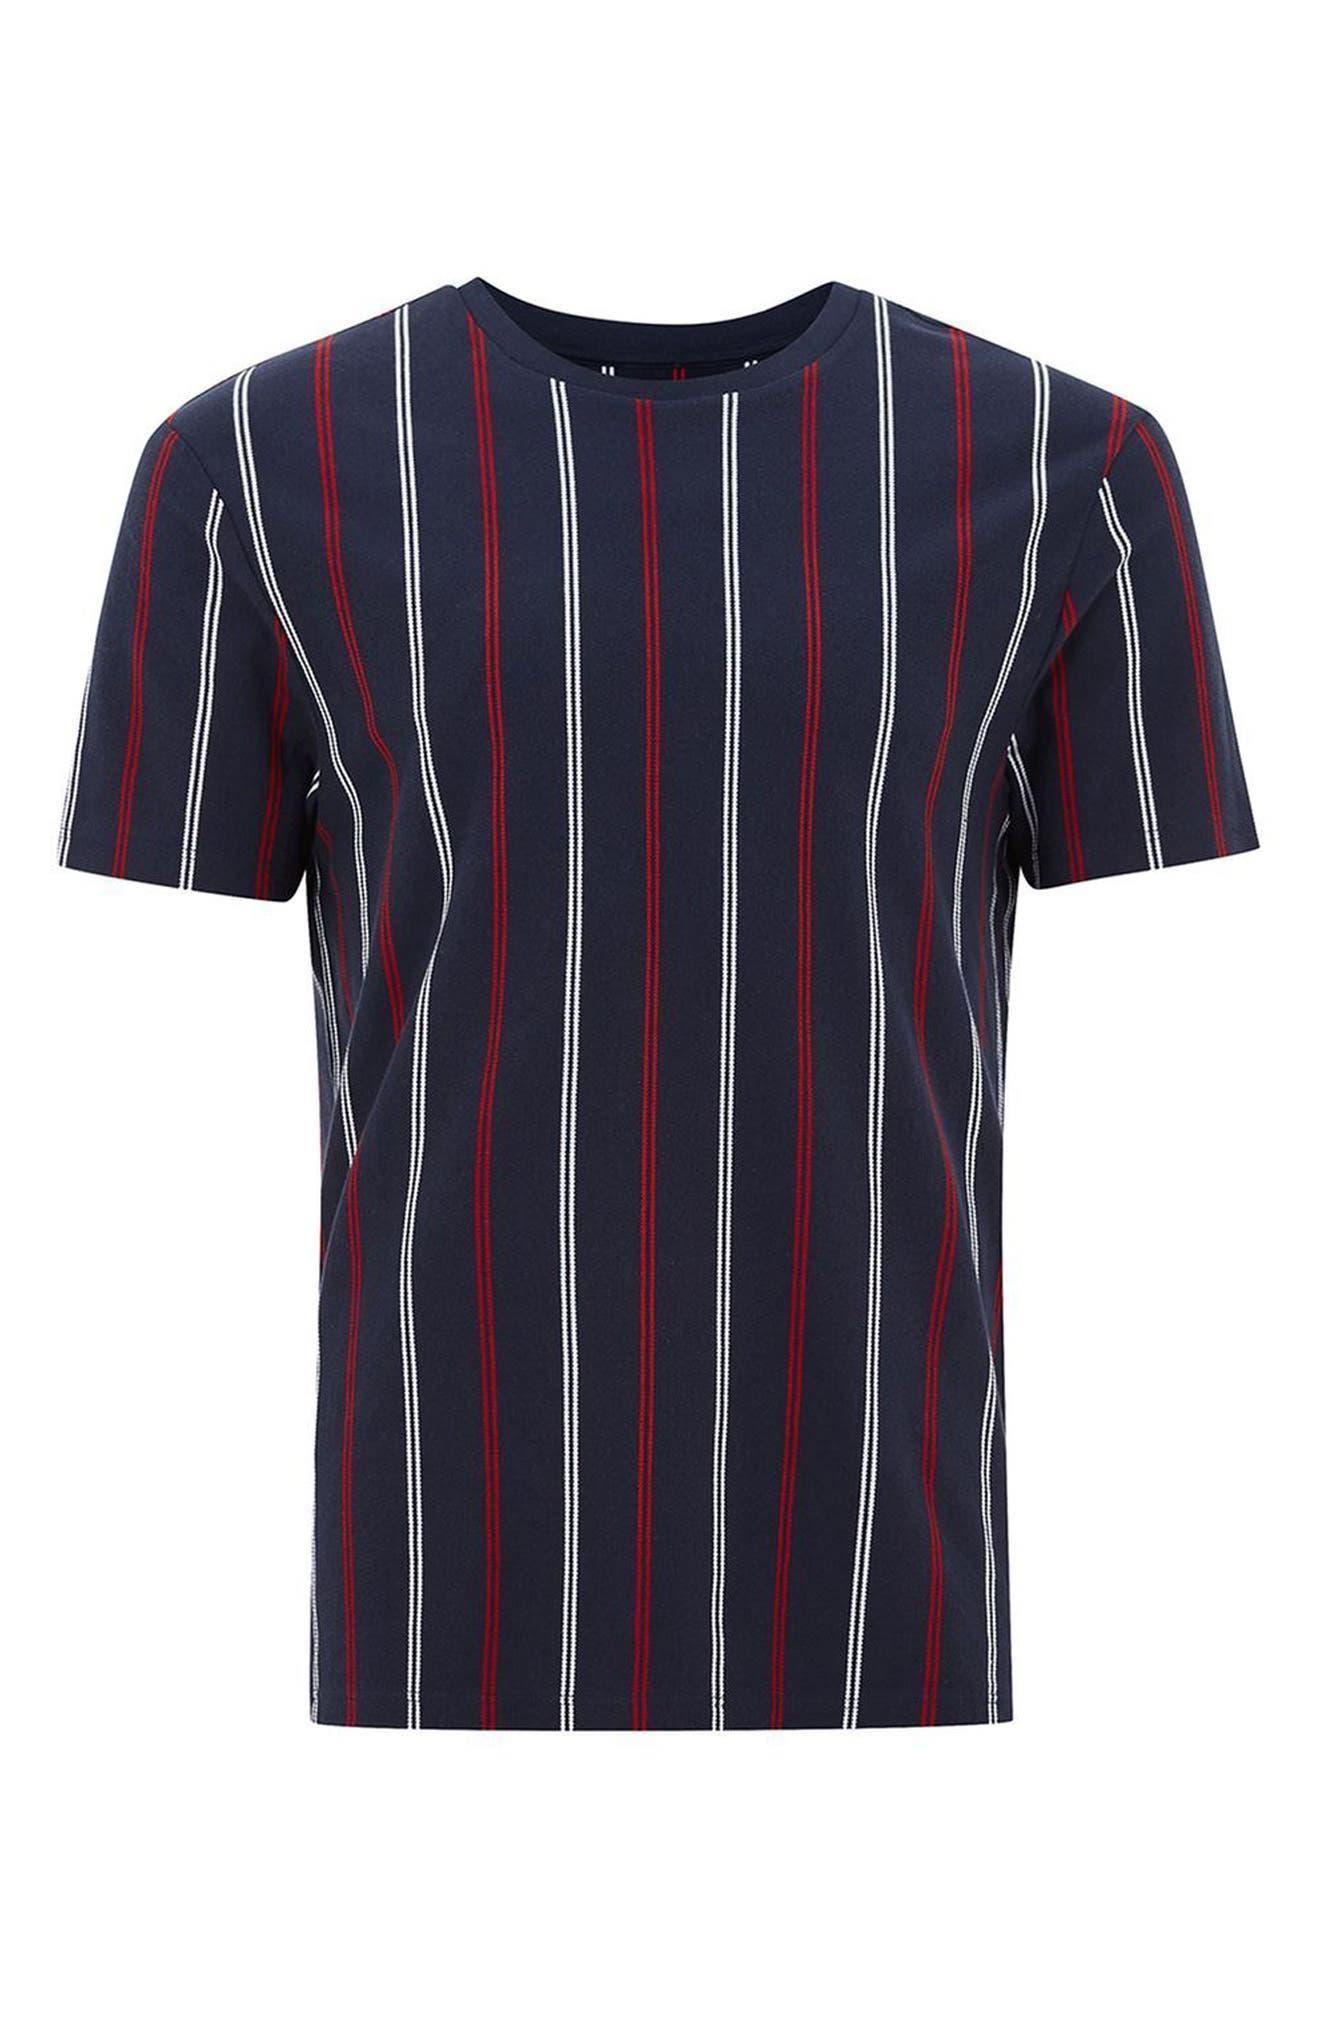 Slim Fit Vertical Striped T-Shirt,                             Alternate thumbnail 4, color,                             Dark Blue Multi